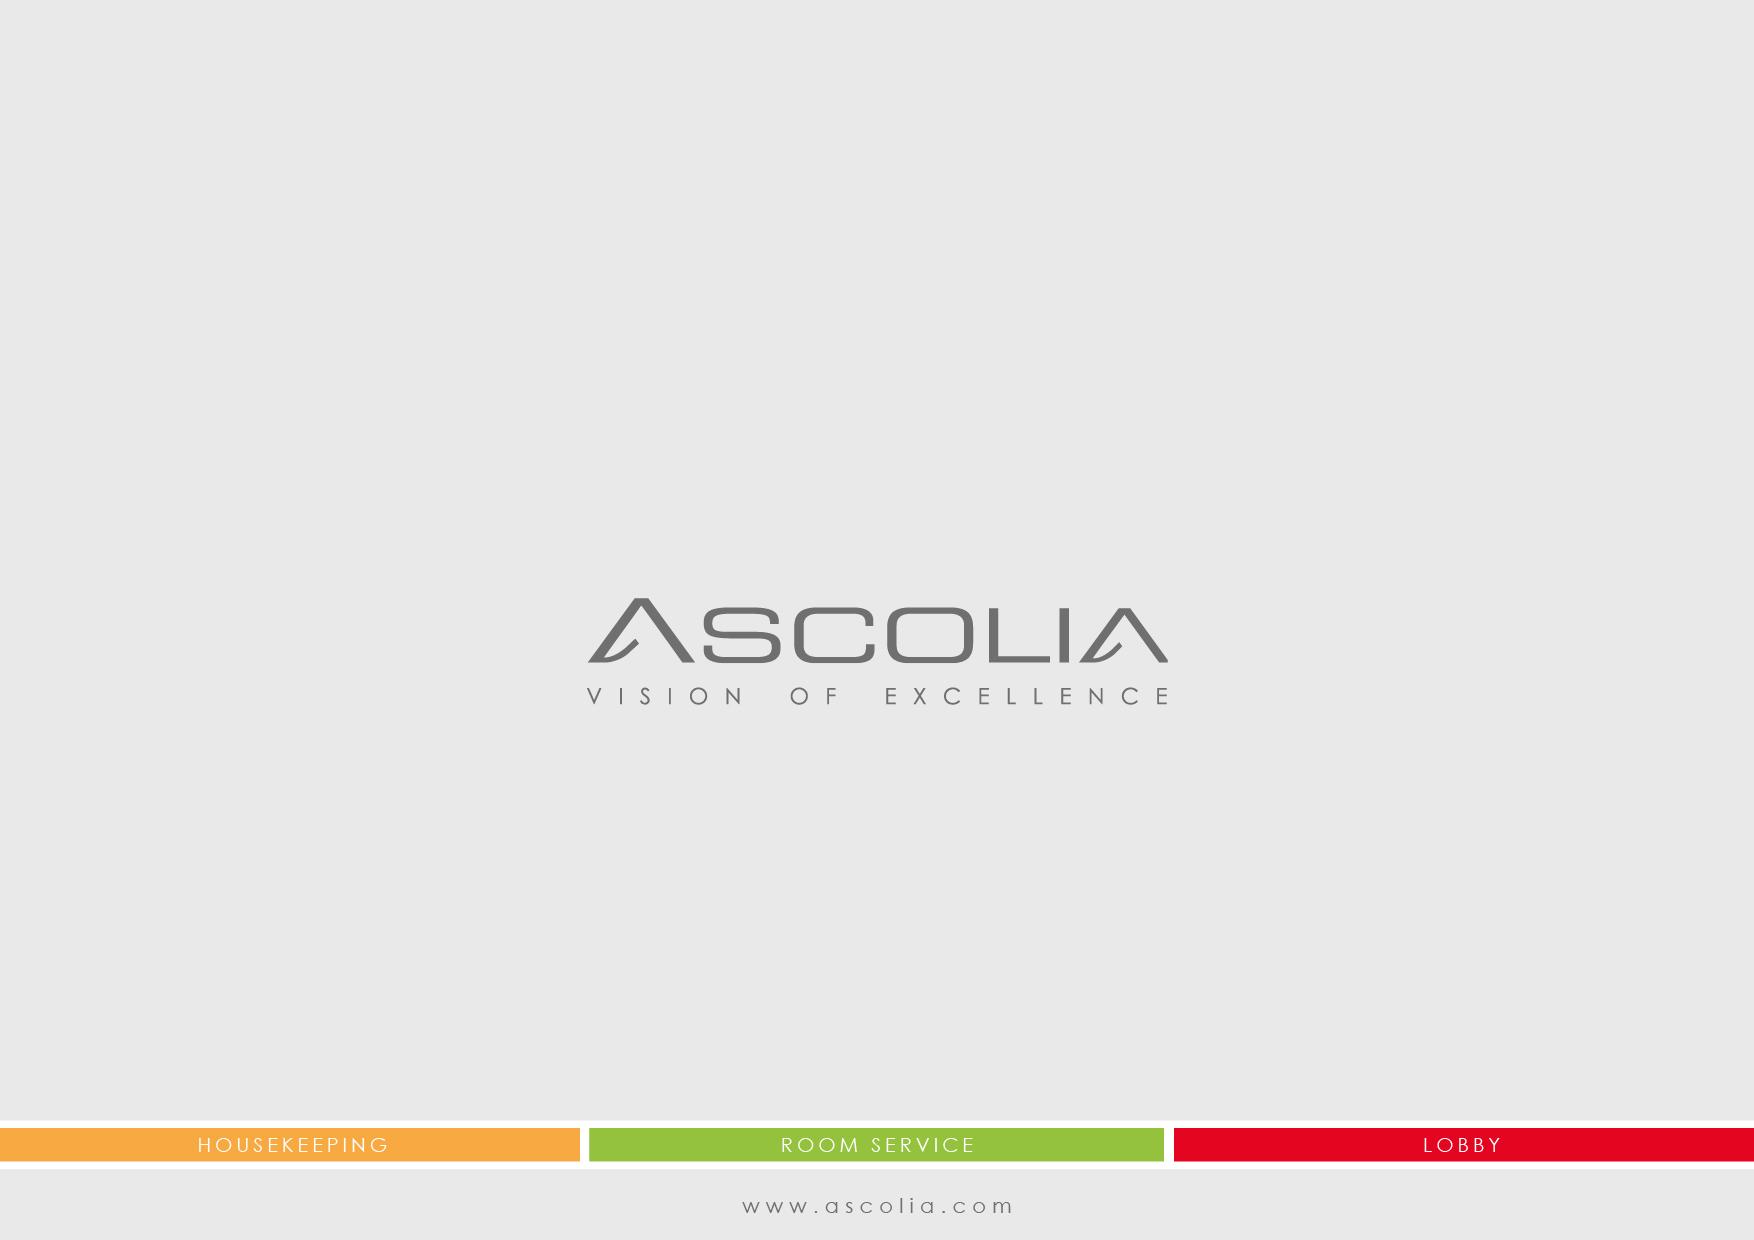 https://www.schoenhuberfranchi.it/wp-content/uploads/2021/06/Ascolia-cover-catalogue.jpg